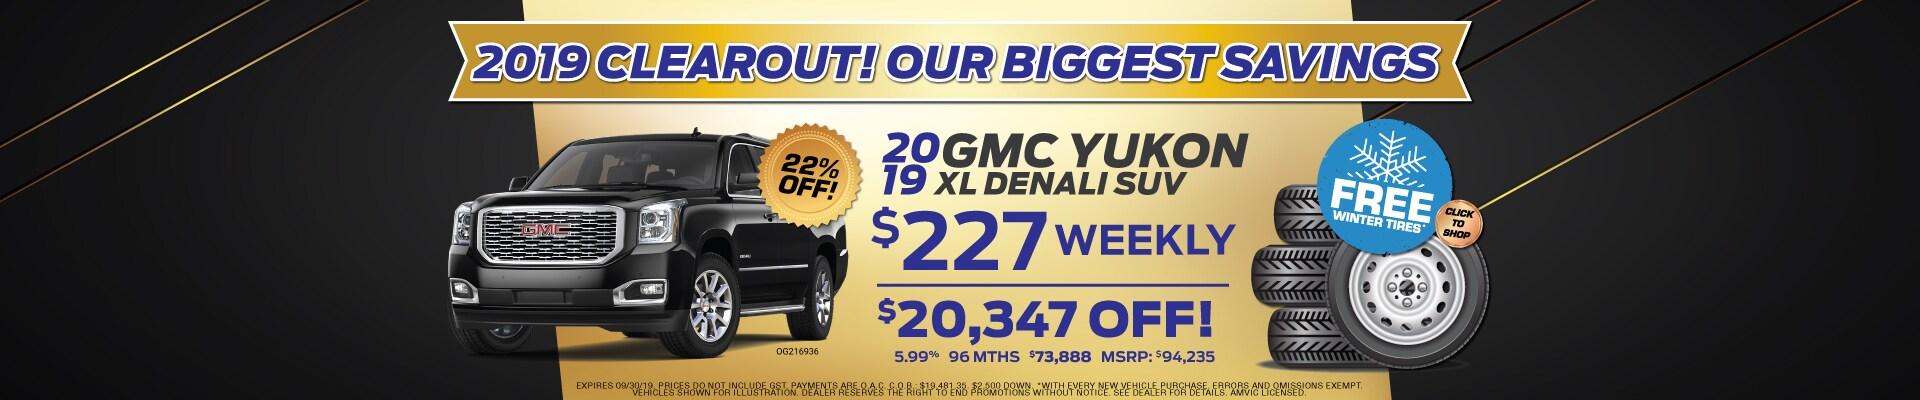 Okotoks Chevrolet Buick Gmc Gm Car Dealership Near Calgary